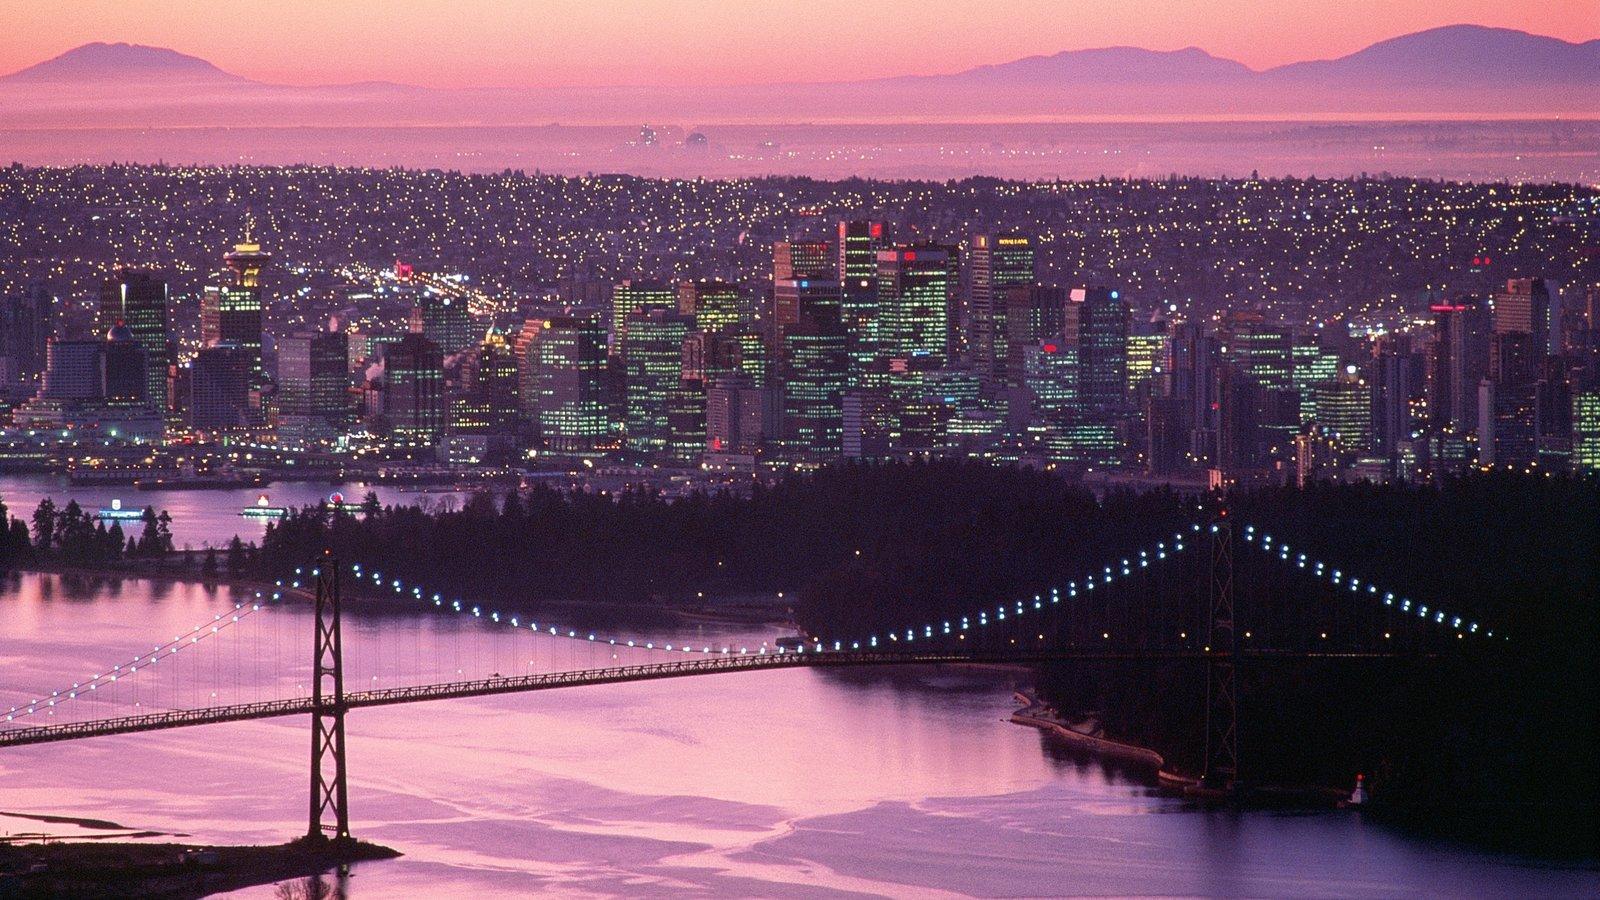 Vancouver showing a suspension bridge or treetop walkway, a bridge and a city